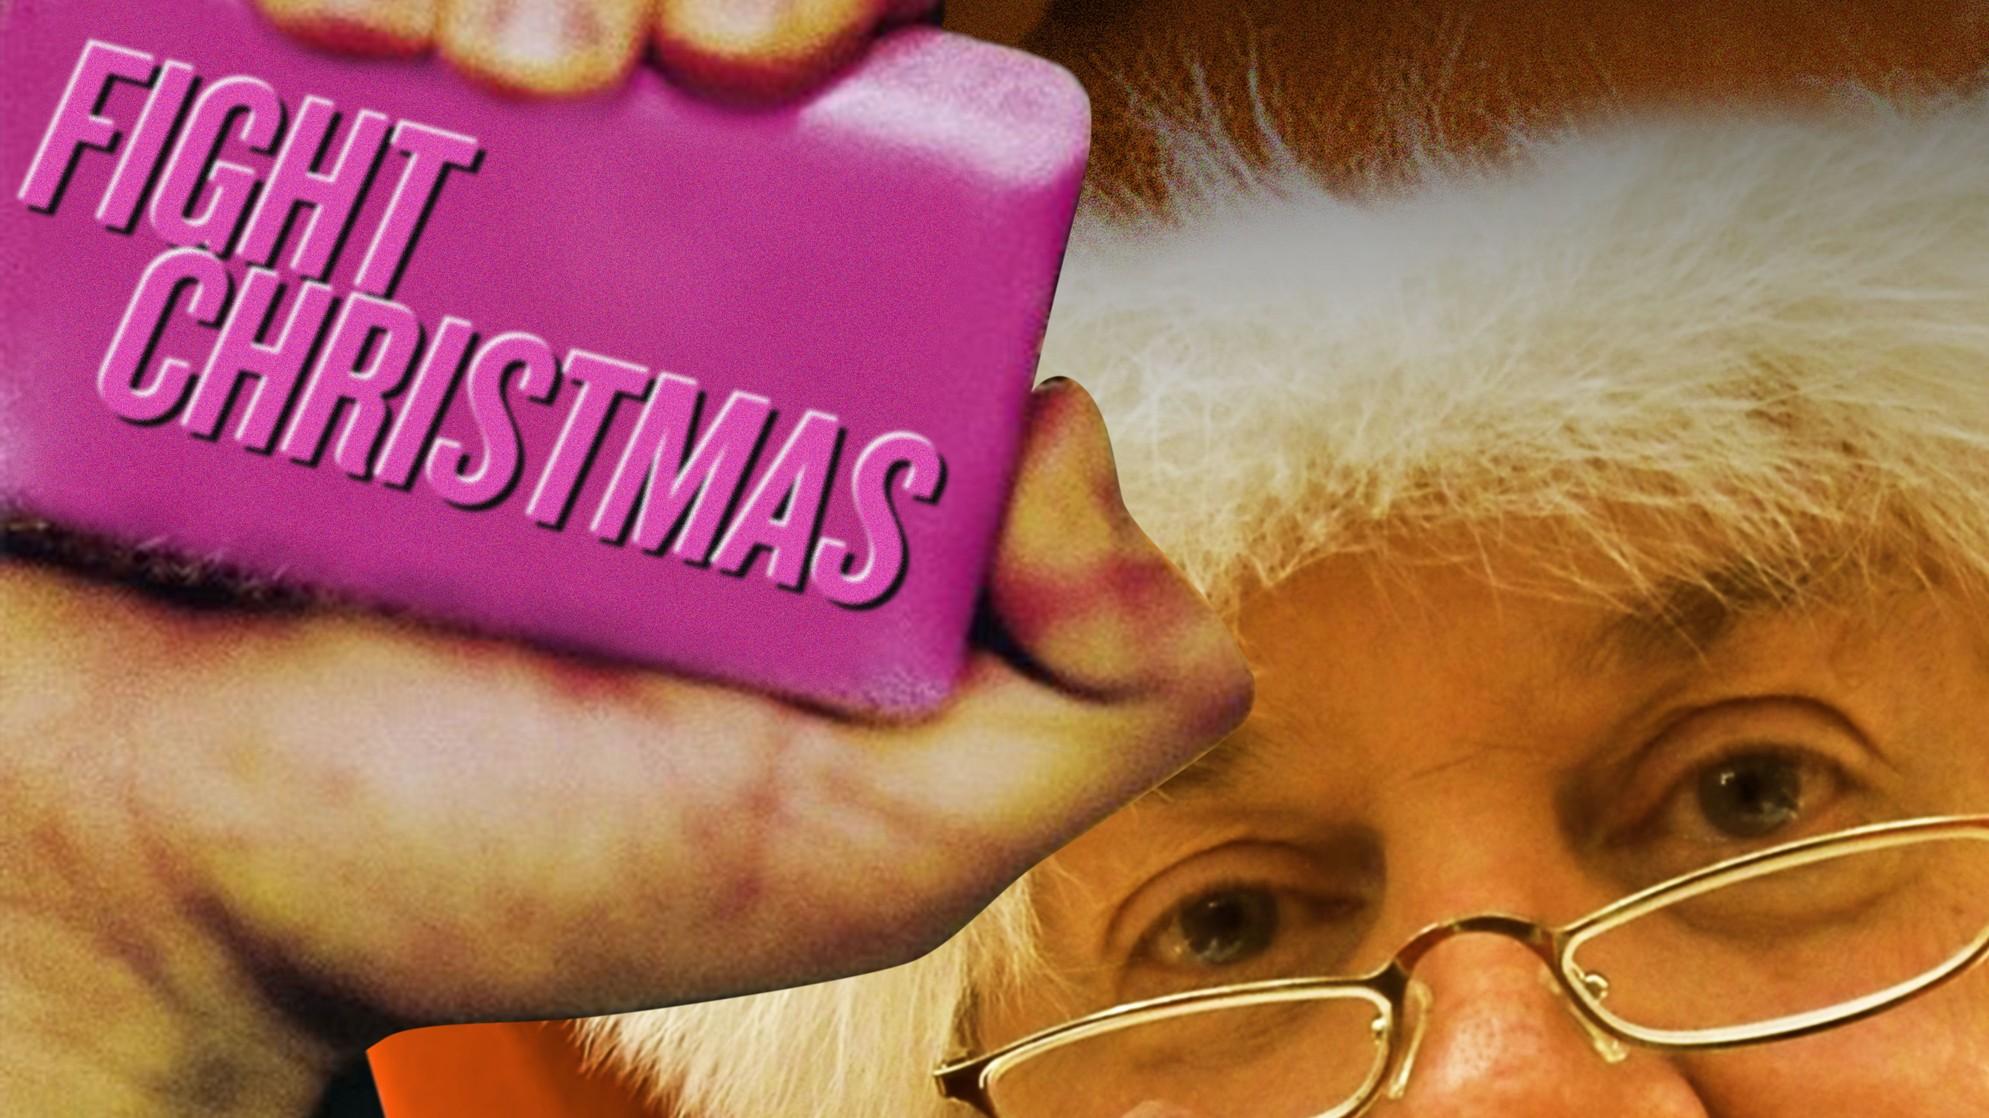 We tried teaching an AI to write Christmas movie plots